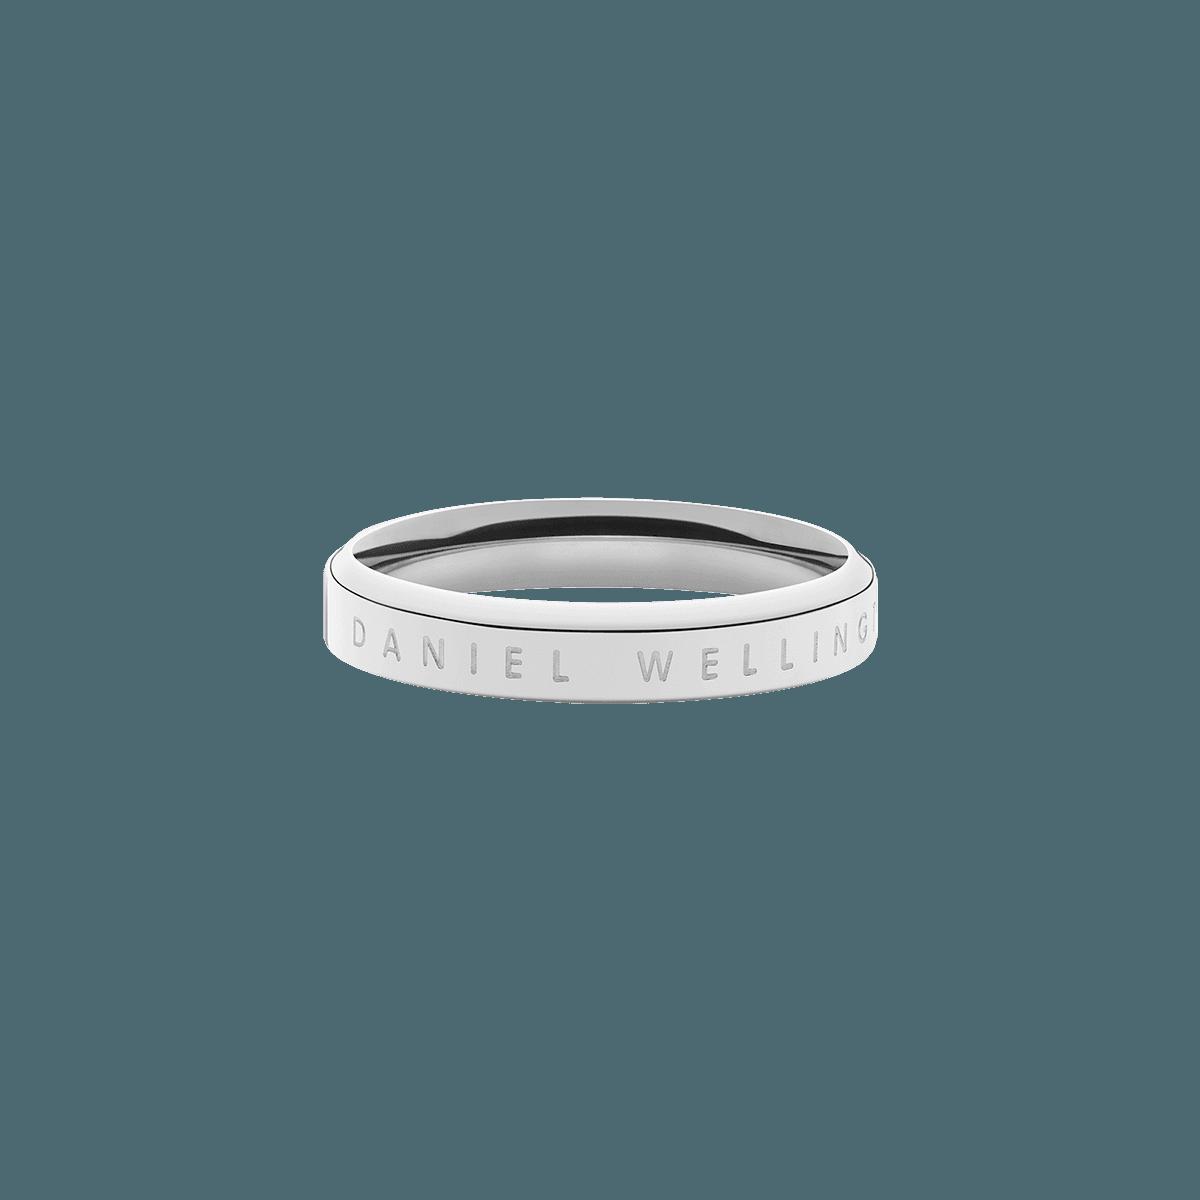 dw官网 dw手表官网 dw中国官网 dw官方旗舰店 DW DW官网  Classic Ring Silver 52mm